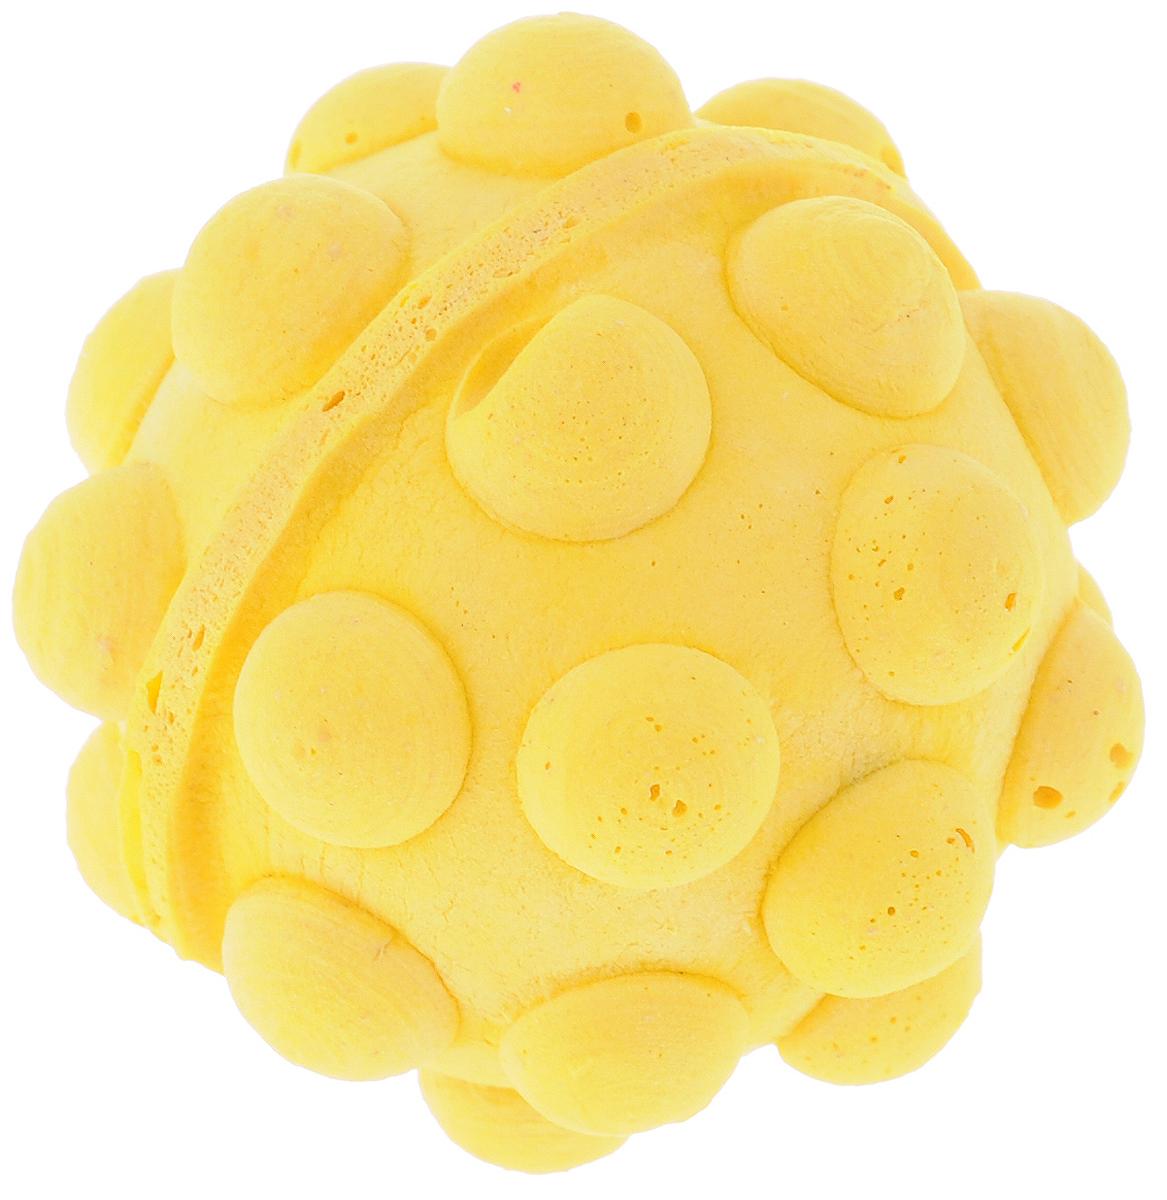 "Игрушка для животных Каскад ""Мячик зефирный. Мина"", цвет: желтый, диаметр 4,5 см 27799309_желтый"